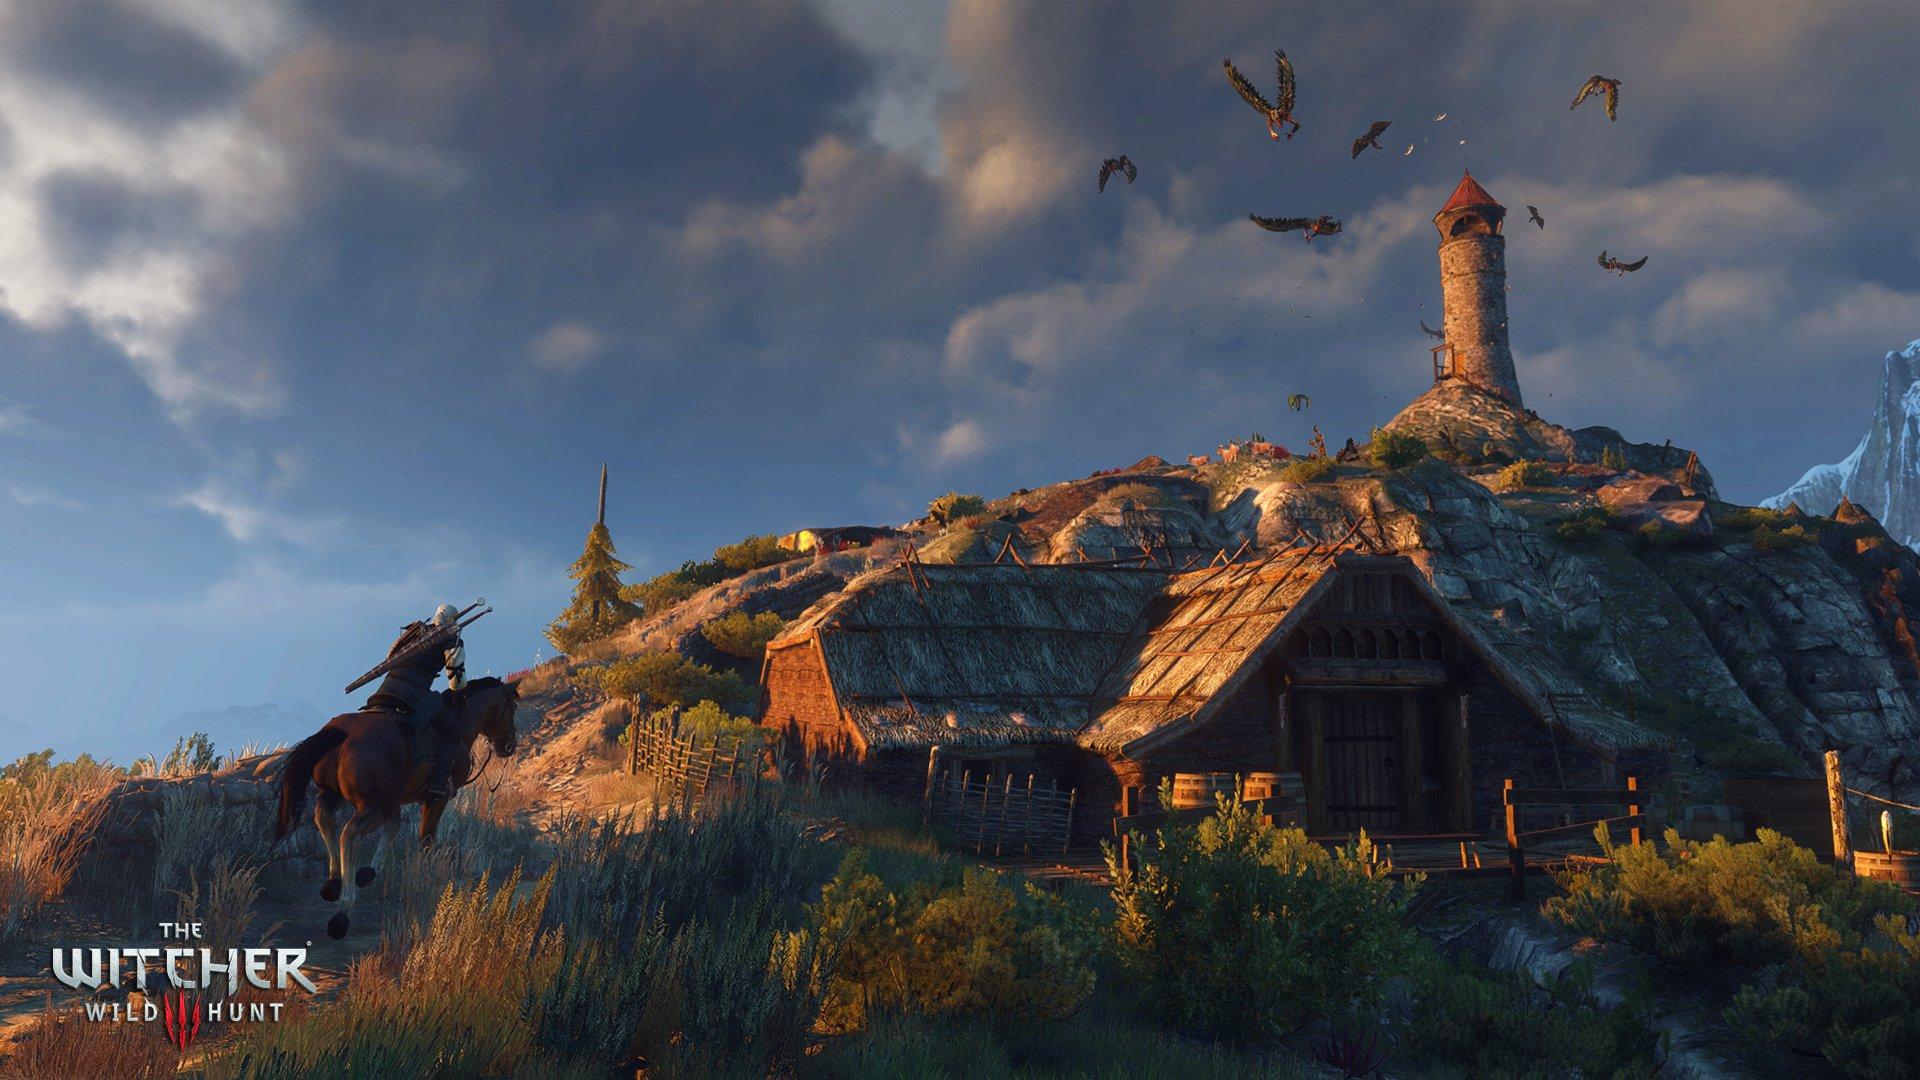 The Witcher 3: Wild Hunt. Презентация CD PROJEKT RED.     CD PROJEKT RED совместно с GOG.com проведут онлайн трансля ... - Изображение 4